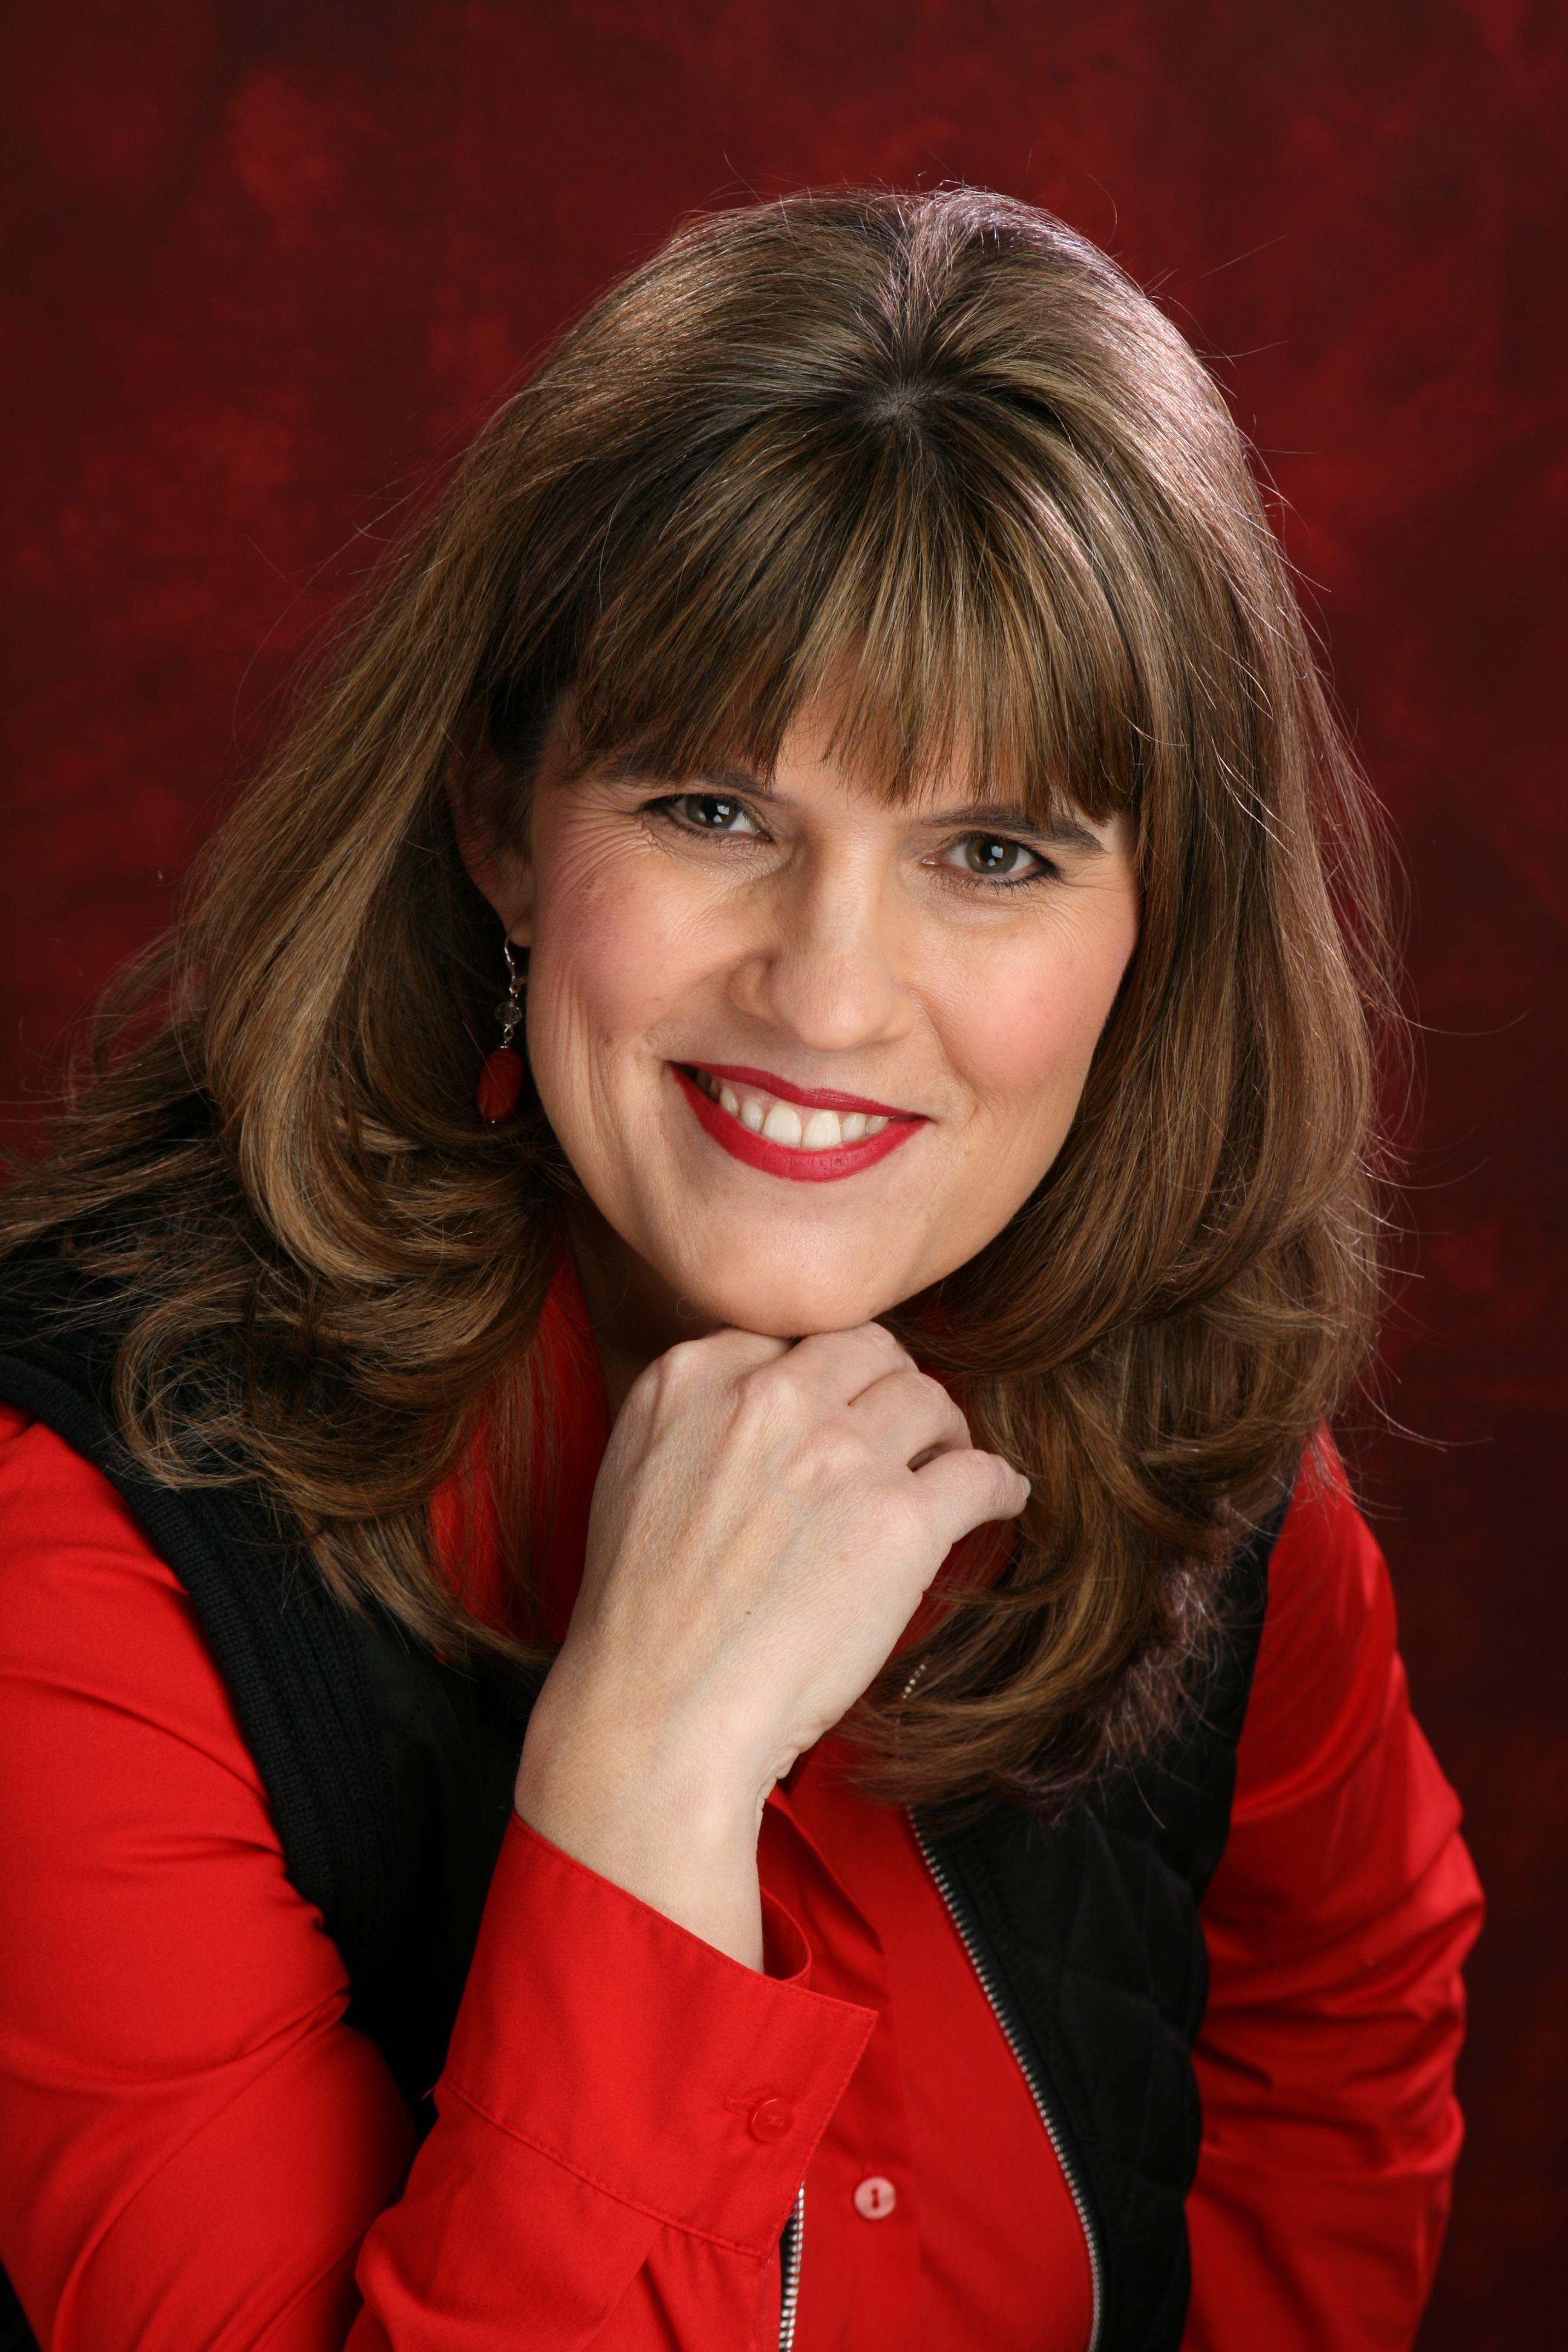 Author Jodi Ashland with hand on chin.jpg